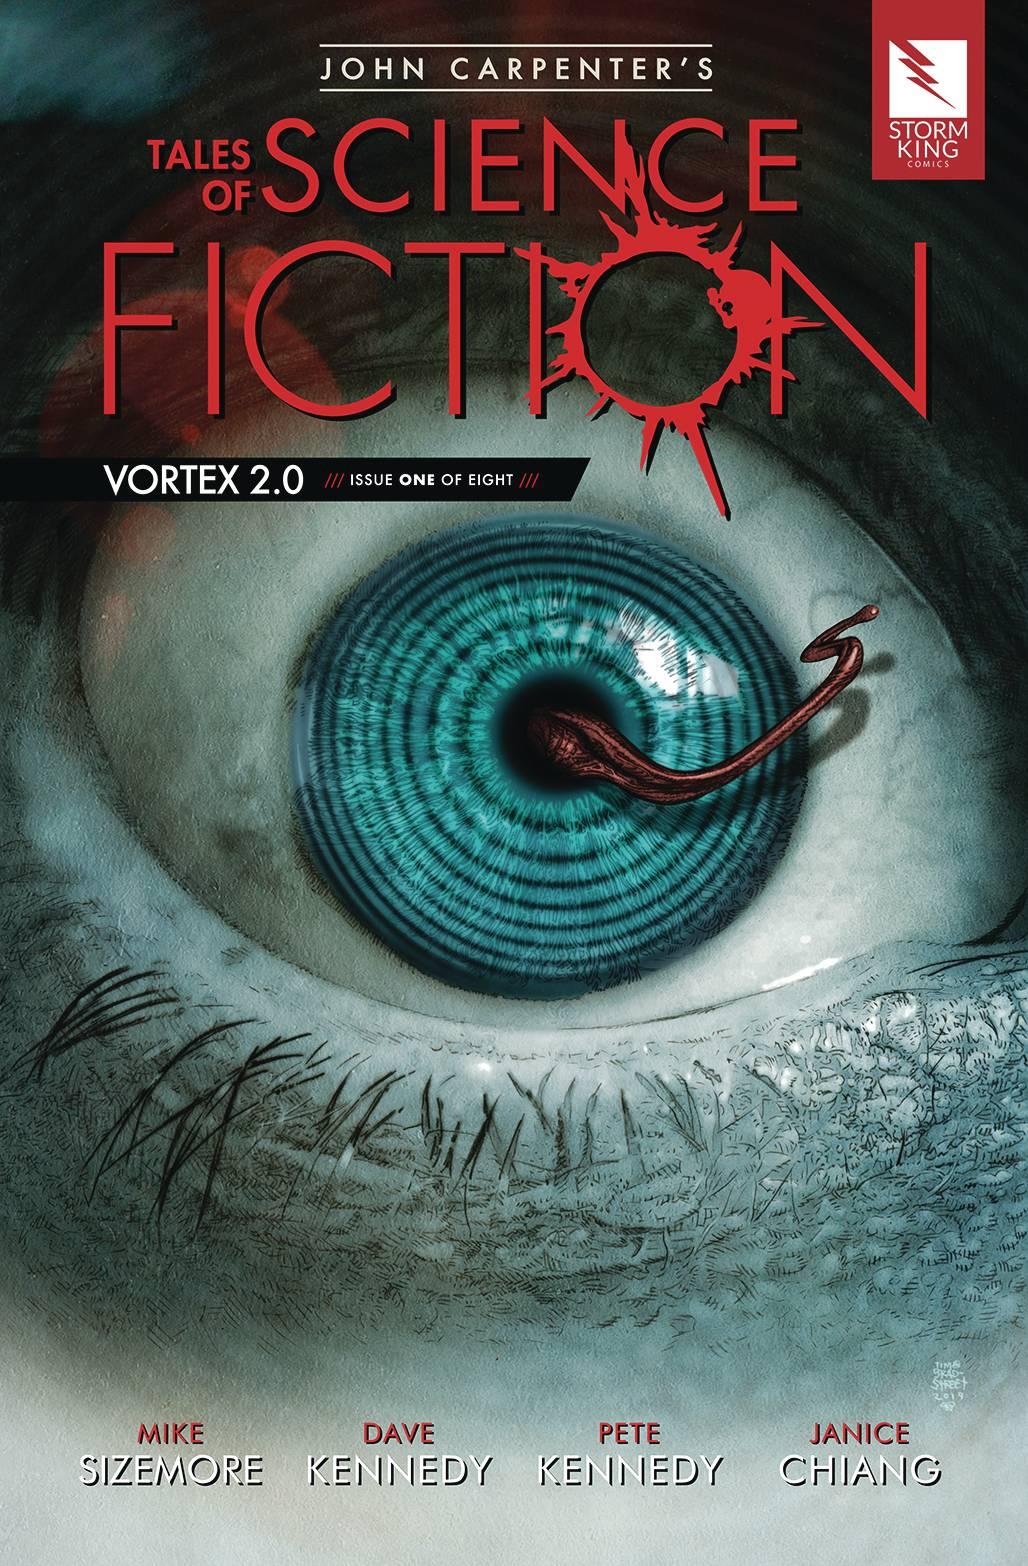 John Carpenter's Tales Science Fiction: Vortex 2 #1 (2020)